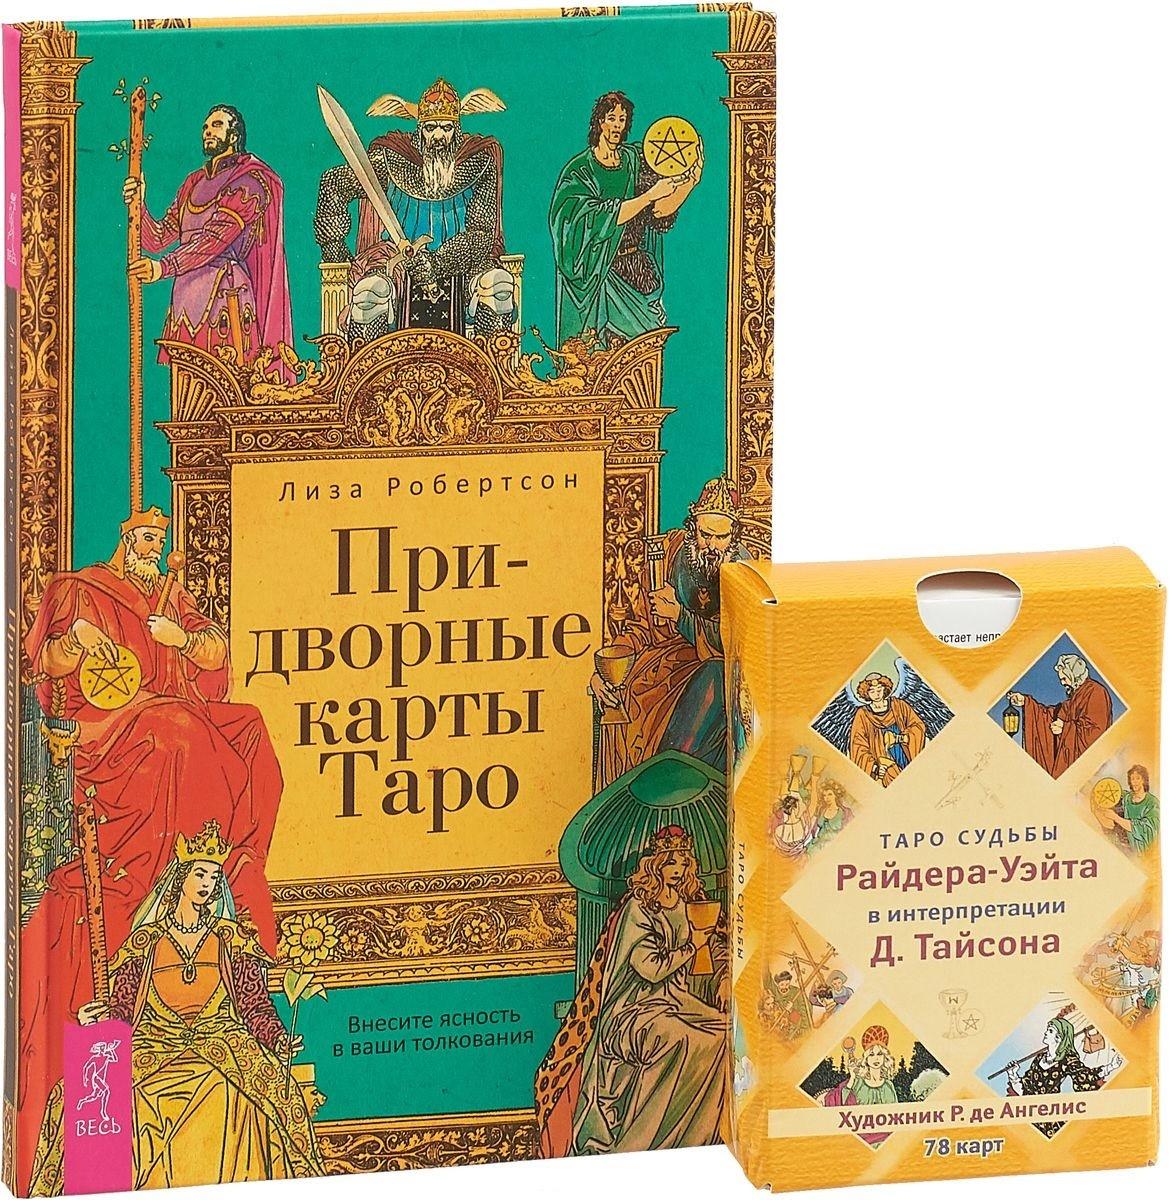 Придворные карты таро. таро Судьбы (Комплект: книга + колода из 78 карт) фото